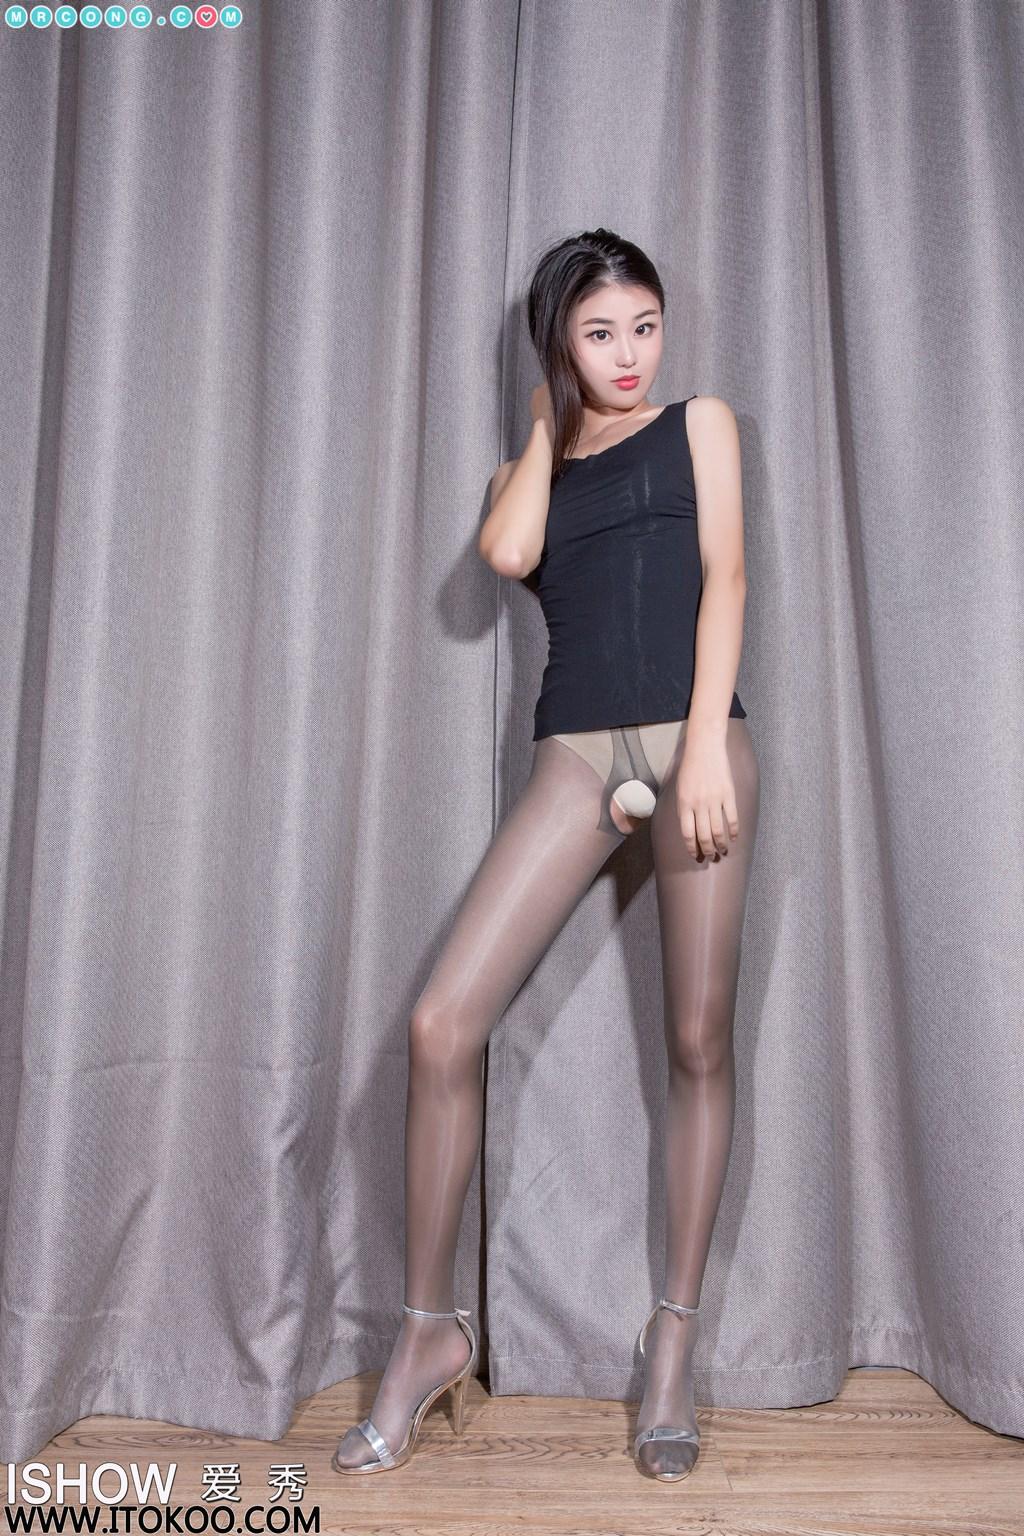 Image ISHOW-No.160-Liu-Yue-Fei-Phoebe-MrCong.com-006 in post ISHOW No.160: Người mẫu Liu Yue Fei (刘玥菲Phoebe) (31 ảnh)